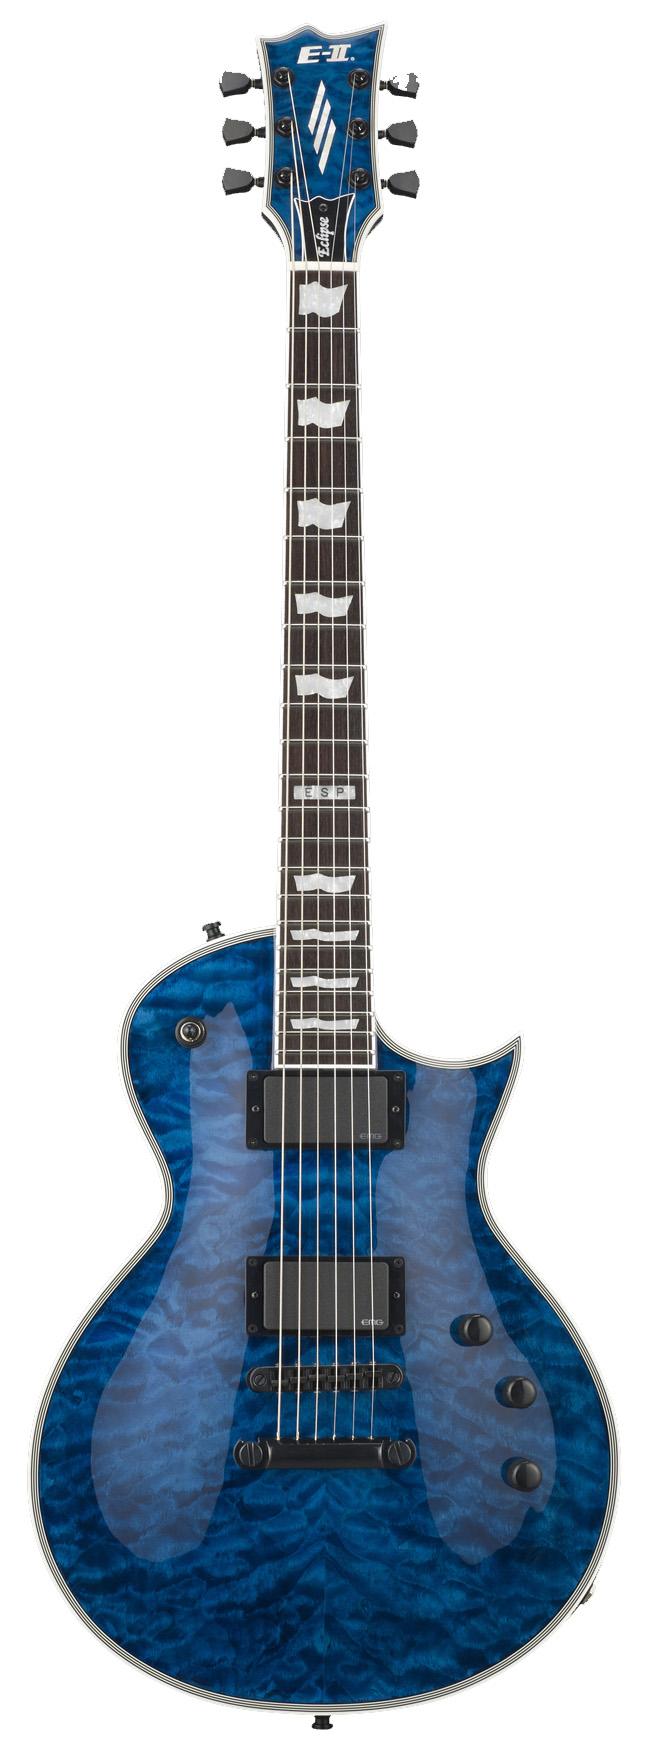 ESP ECLIPSE QM MARBL E-II Quilted Maple Electric Guitar Mahogany Body Marine Blue Finish